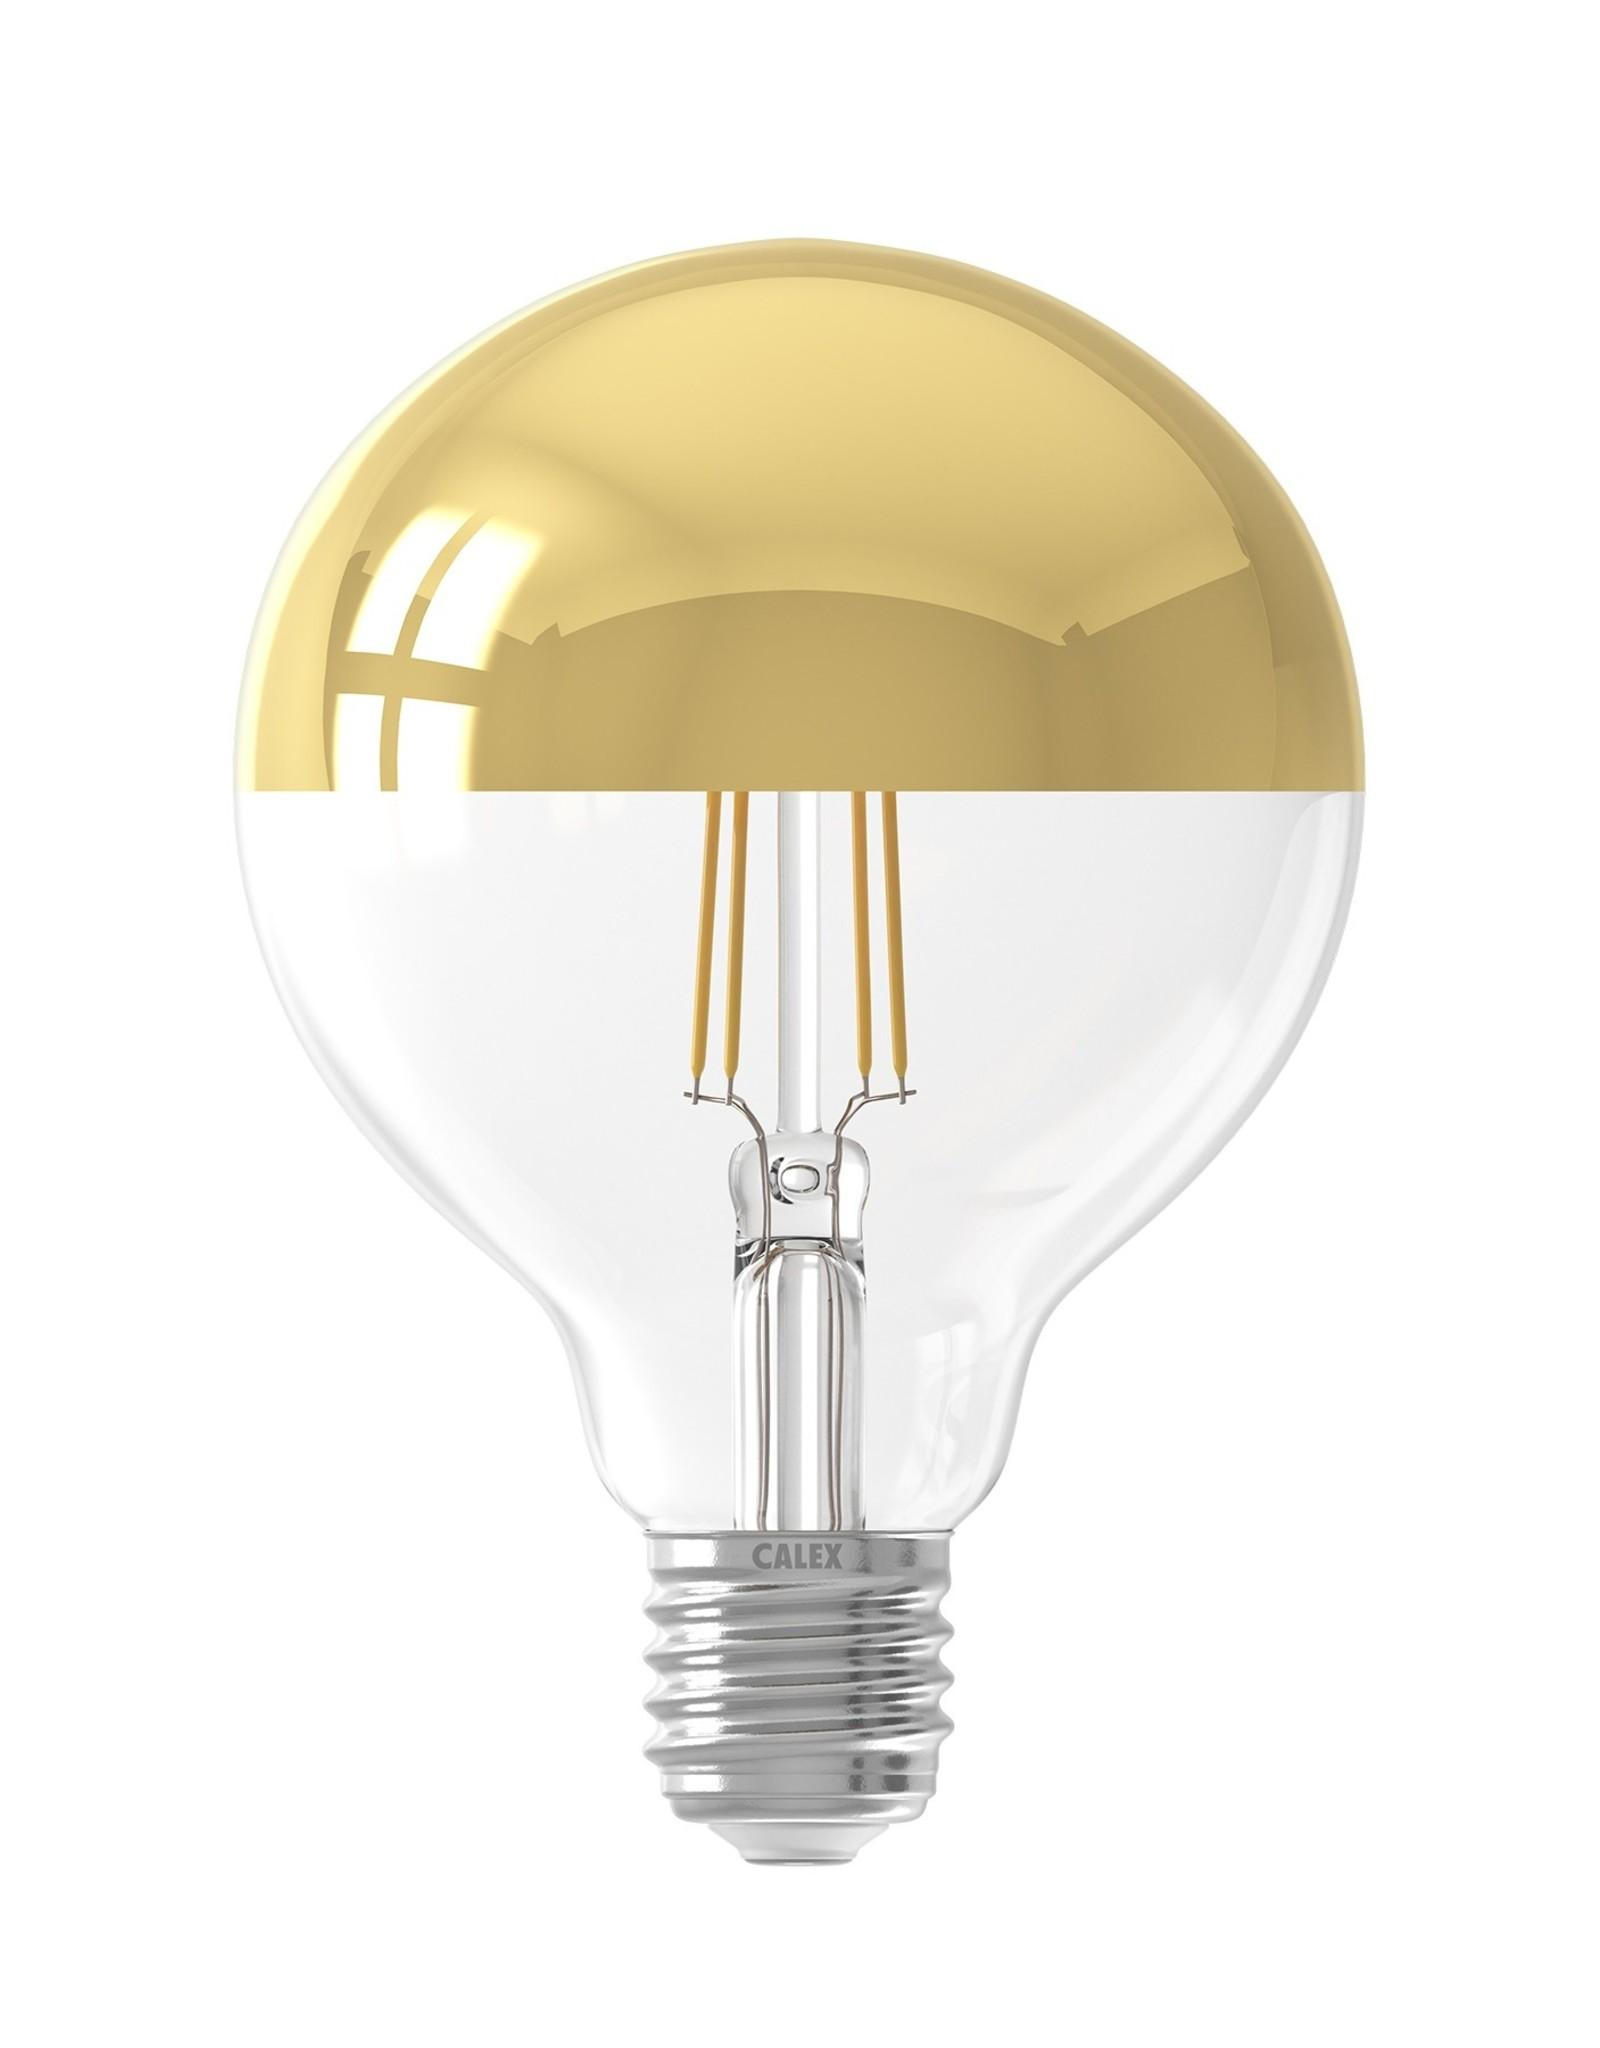 Calex LED kopspiegel 95mm Gold 4W 230V E27 2300K